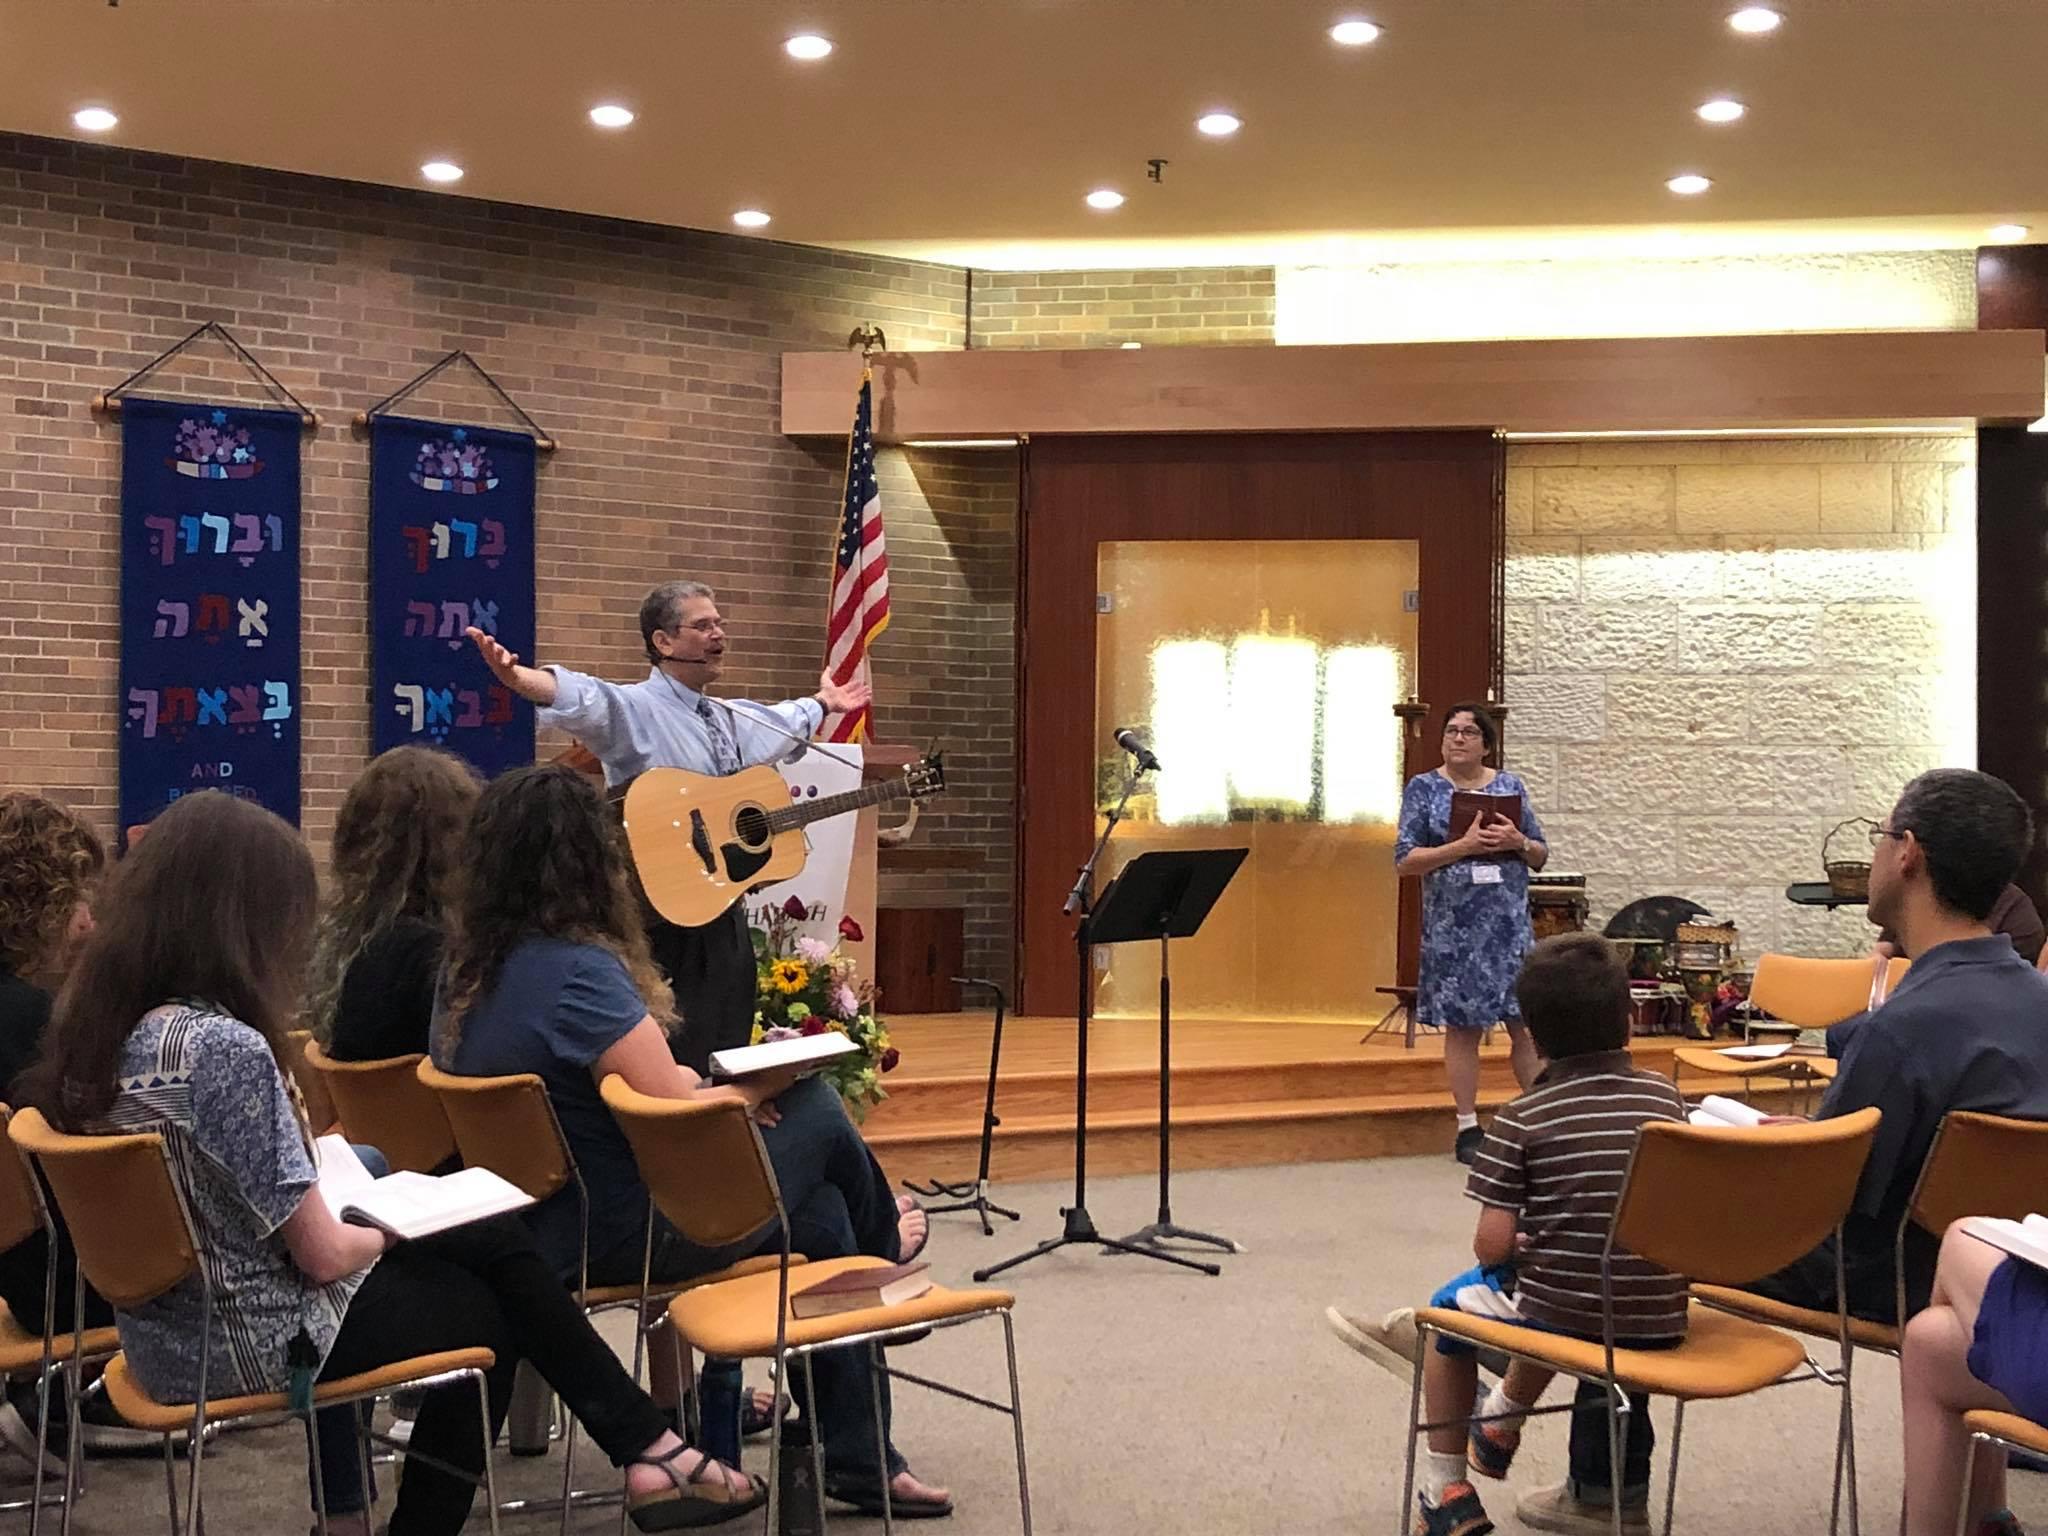 Rabbi Eitan sings